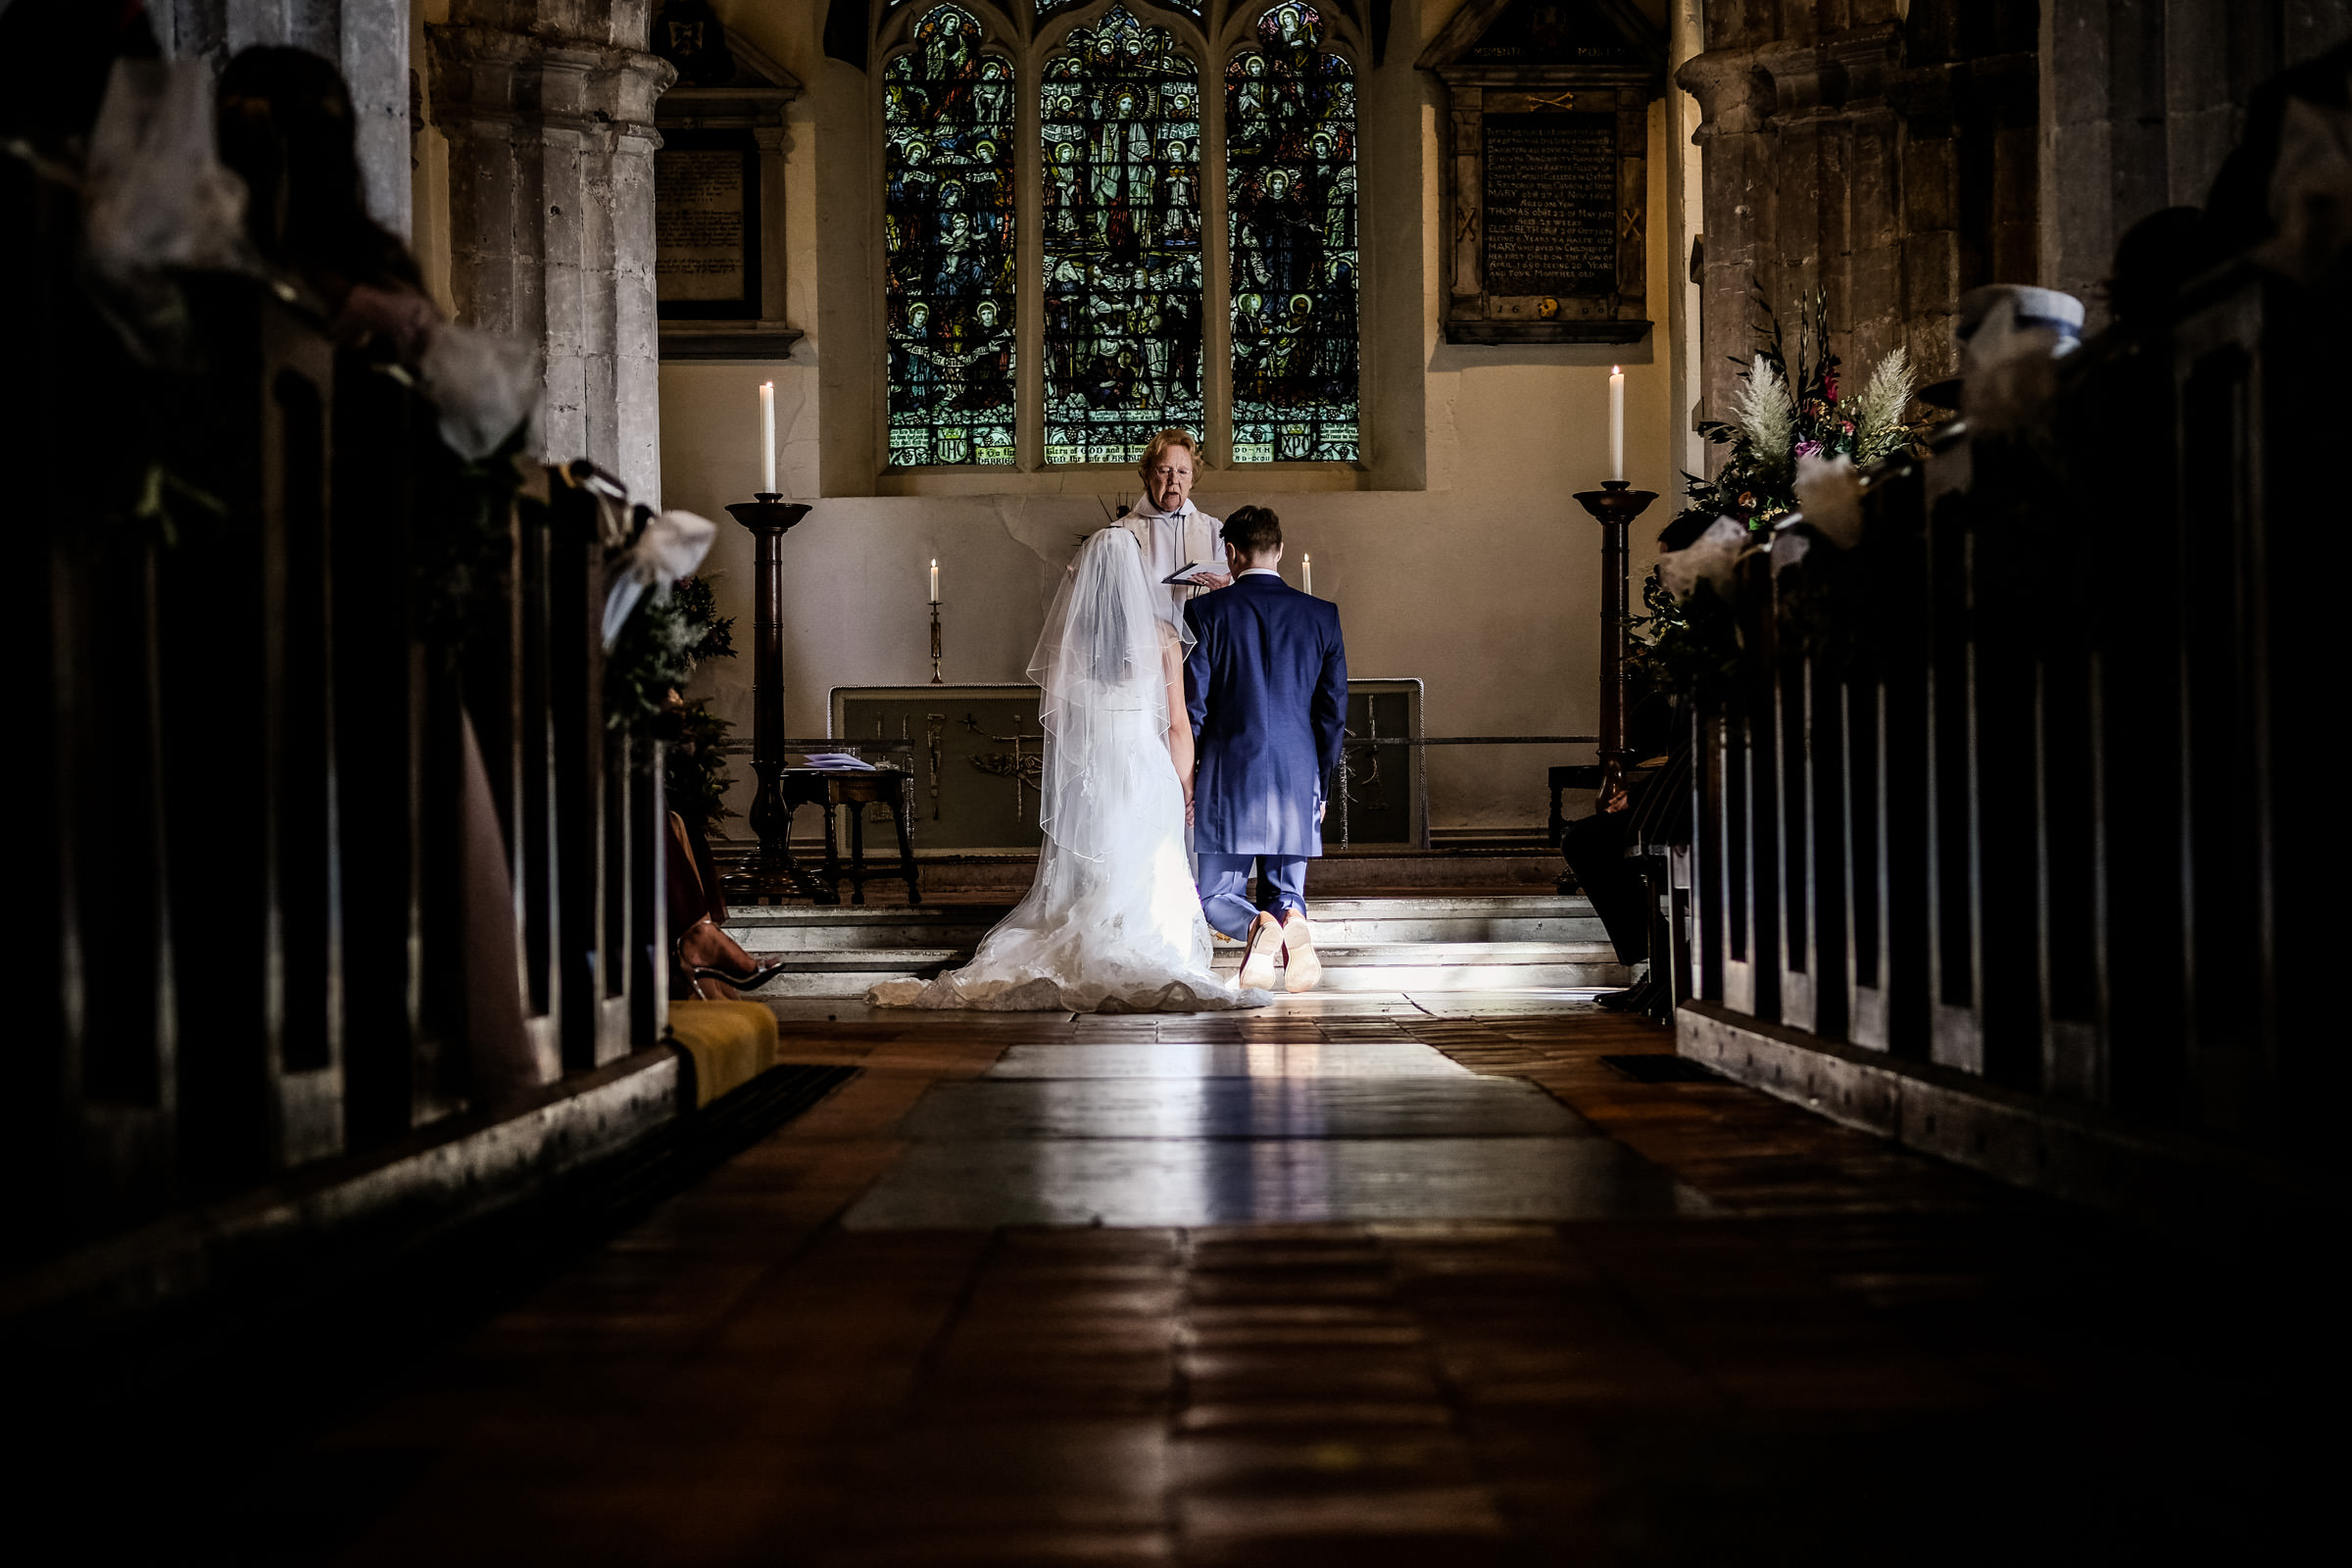 Talbot+Inn+Wedding+Photos+Surrey+011.jpg